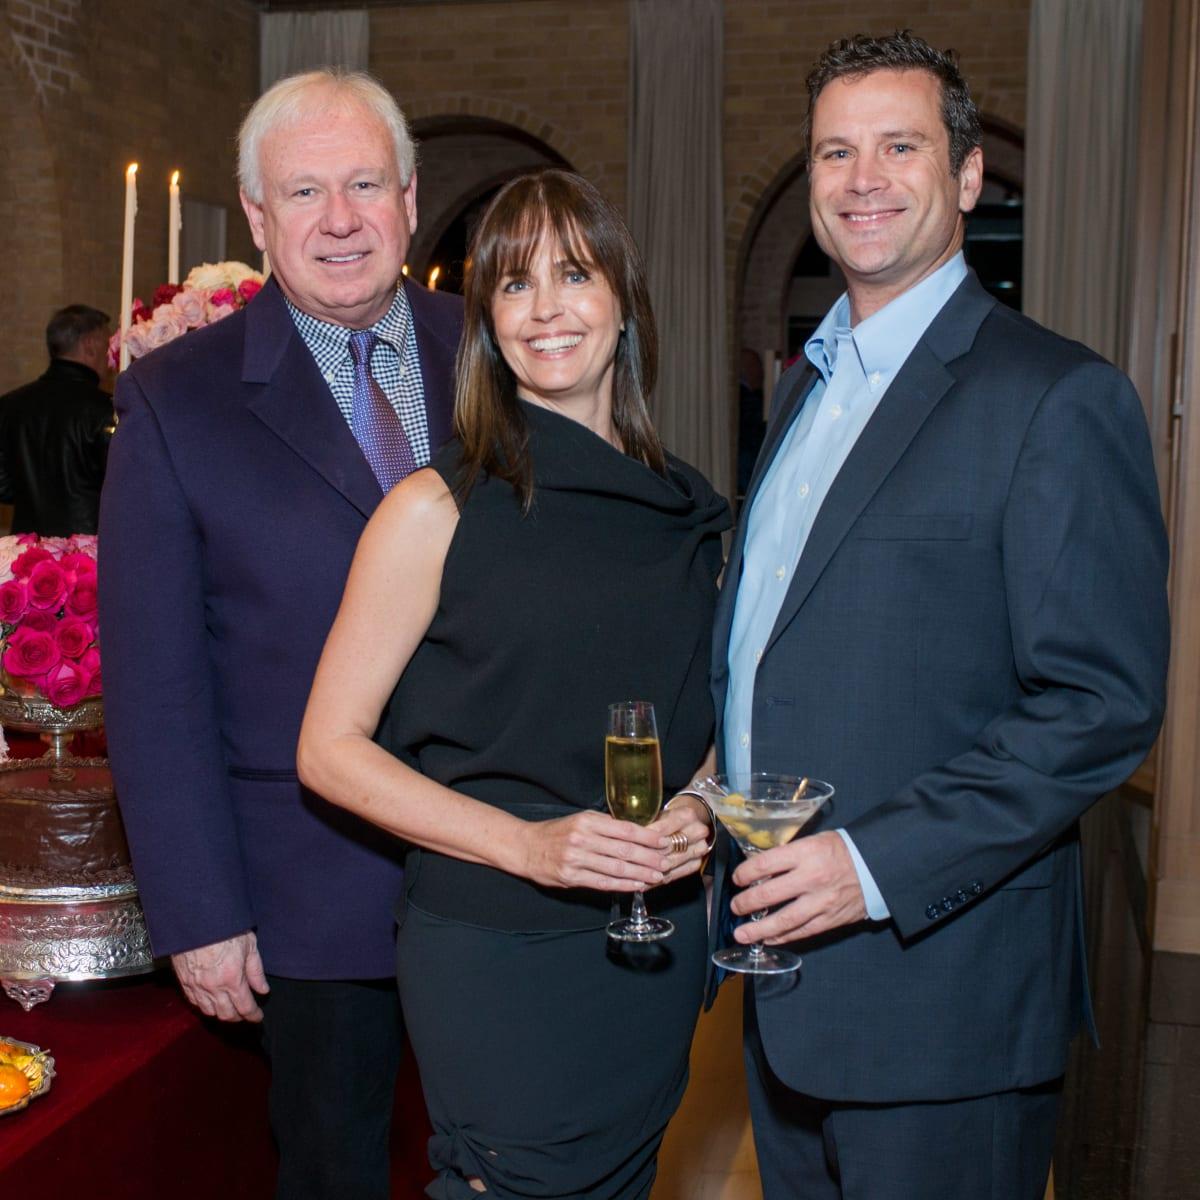 News, Shelby, Dolce & Gabbana dinner, Nov. 2015, John Thrash, Marnie Greenwood, Terence Liff